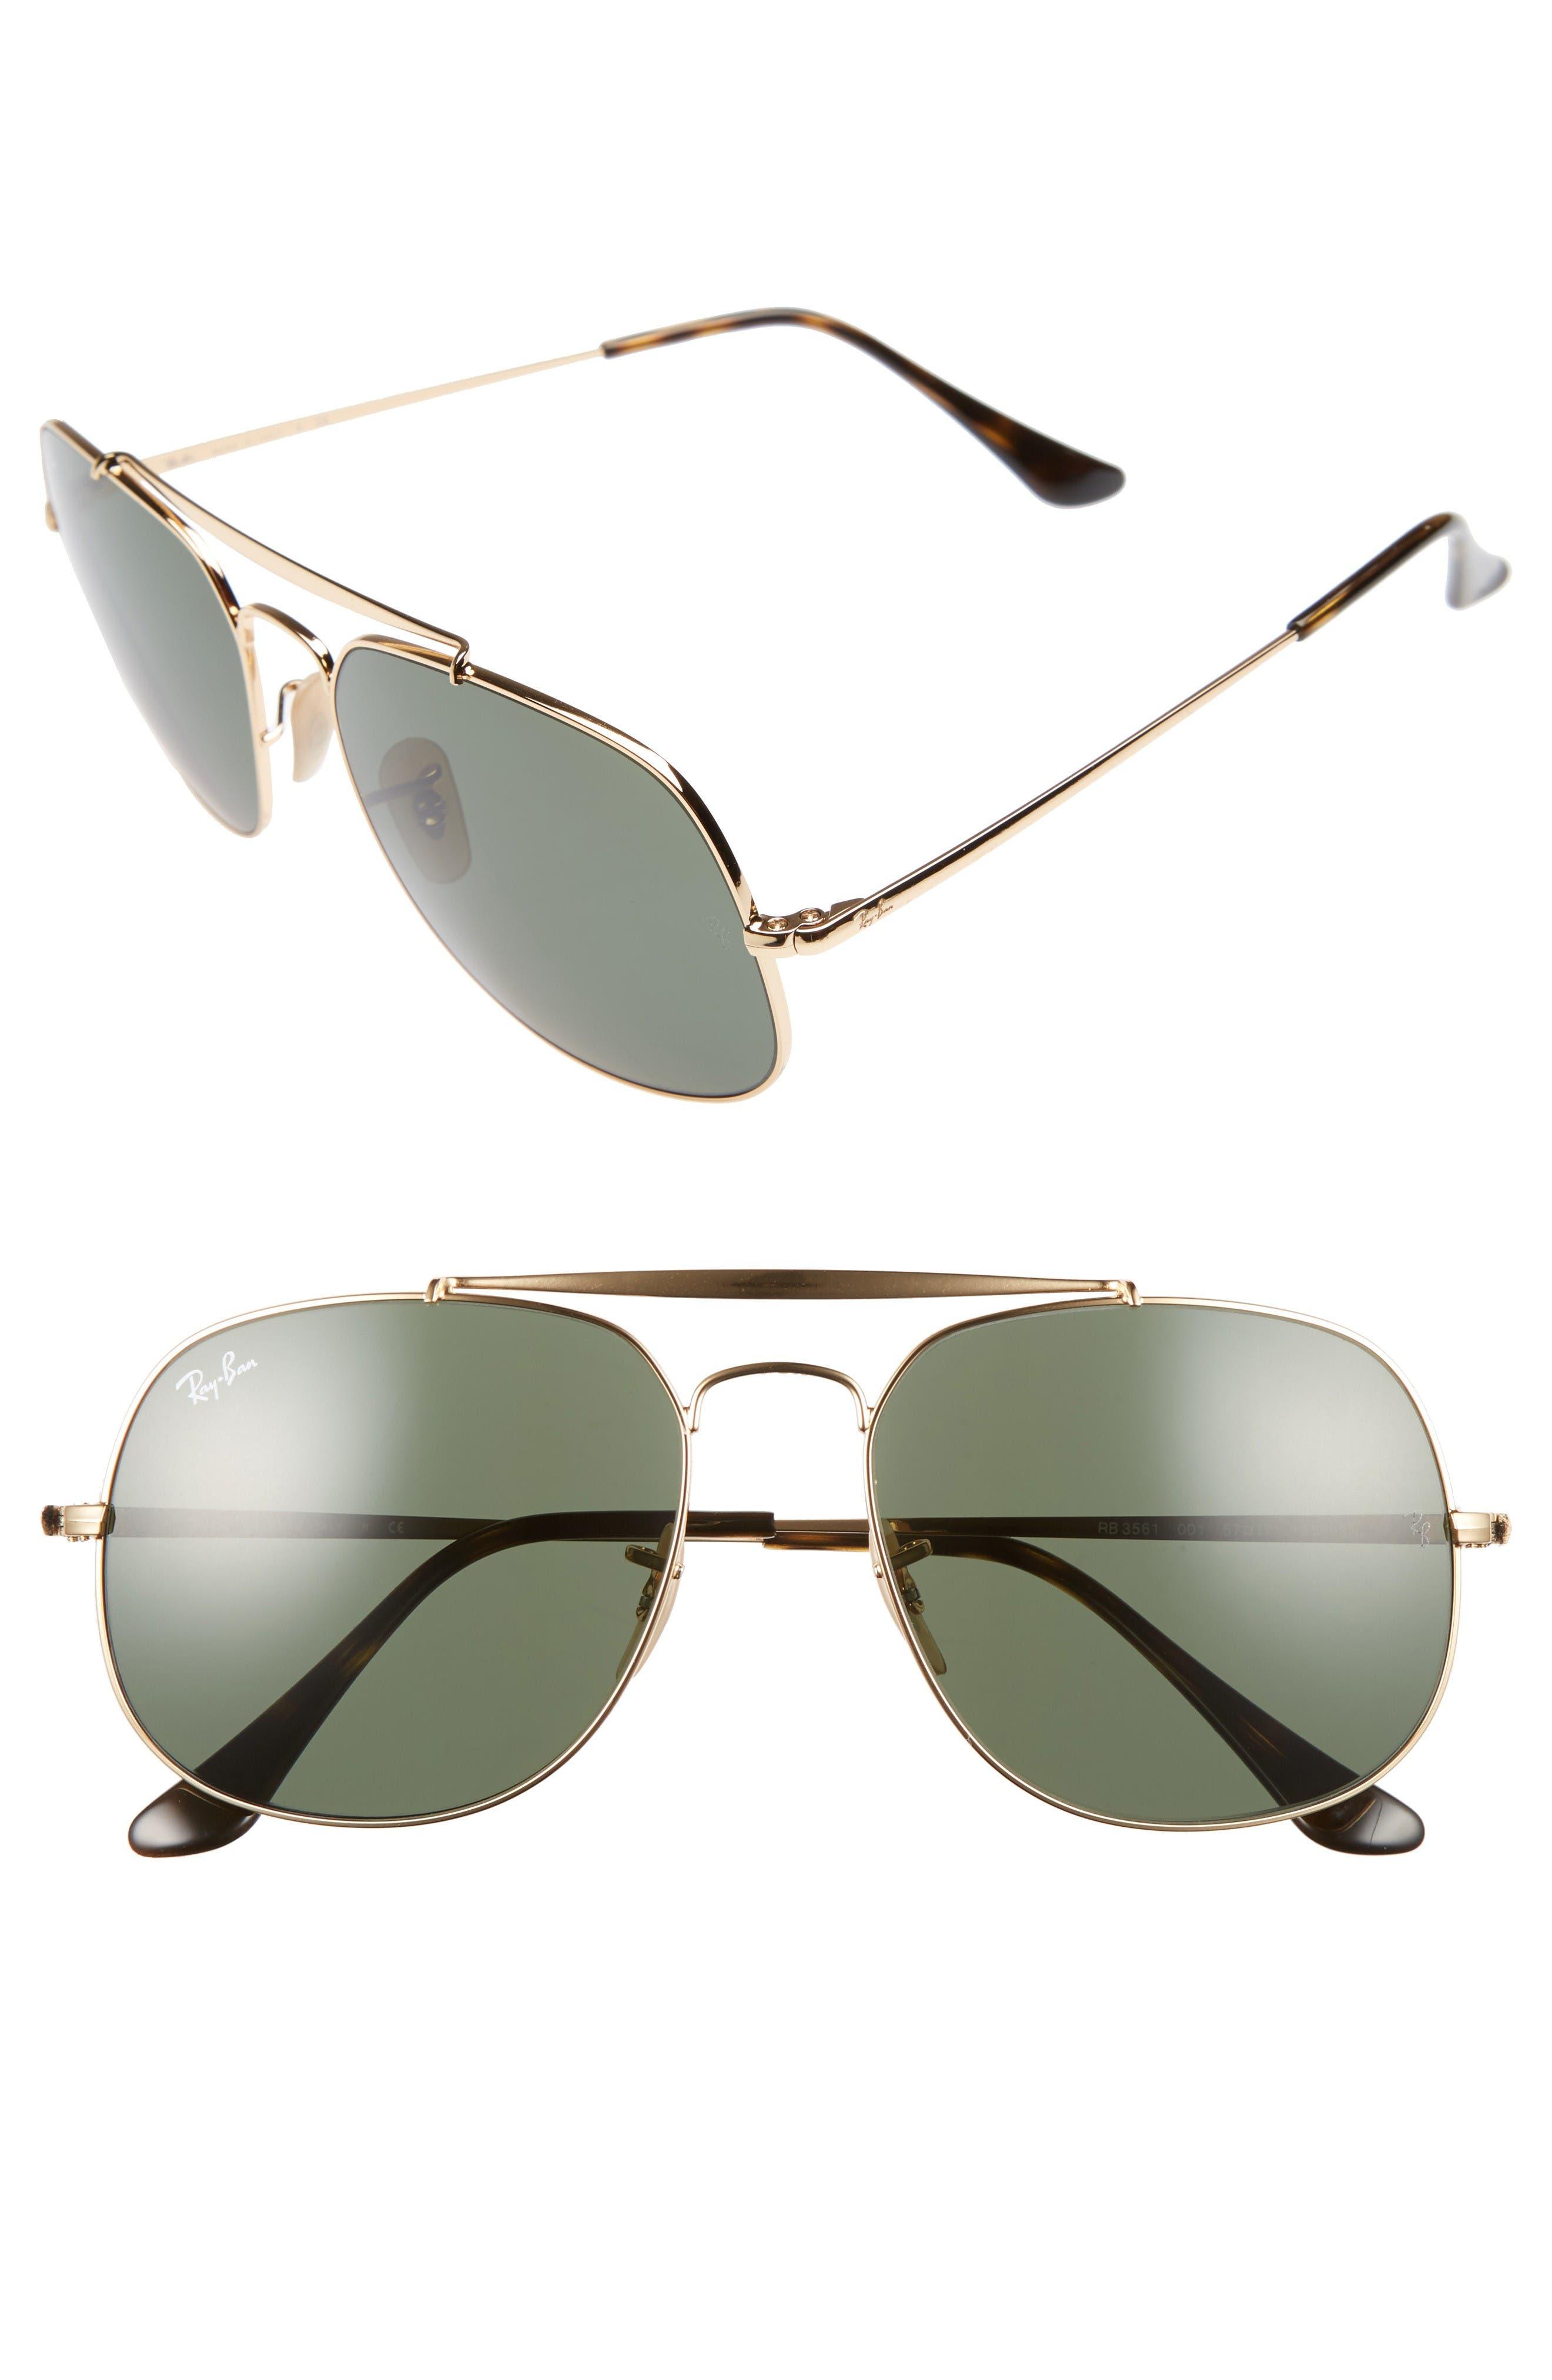 Main Image - Ray-Ban The General 57mm Aviator Sunglasses